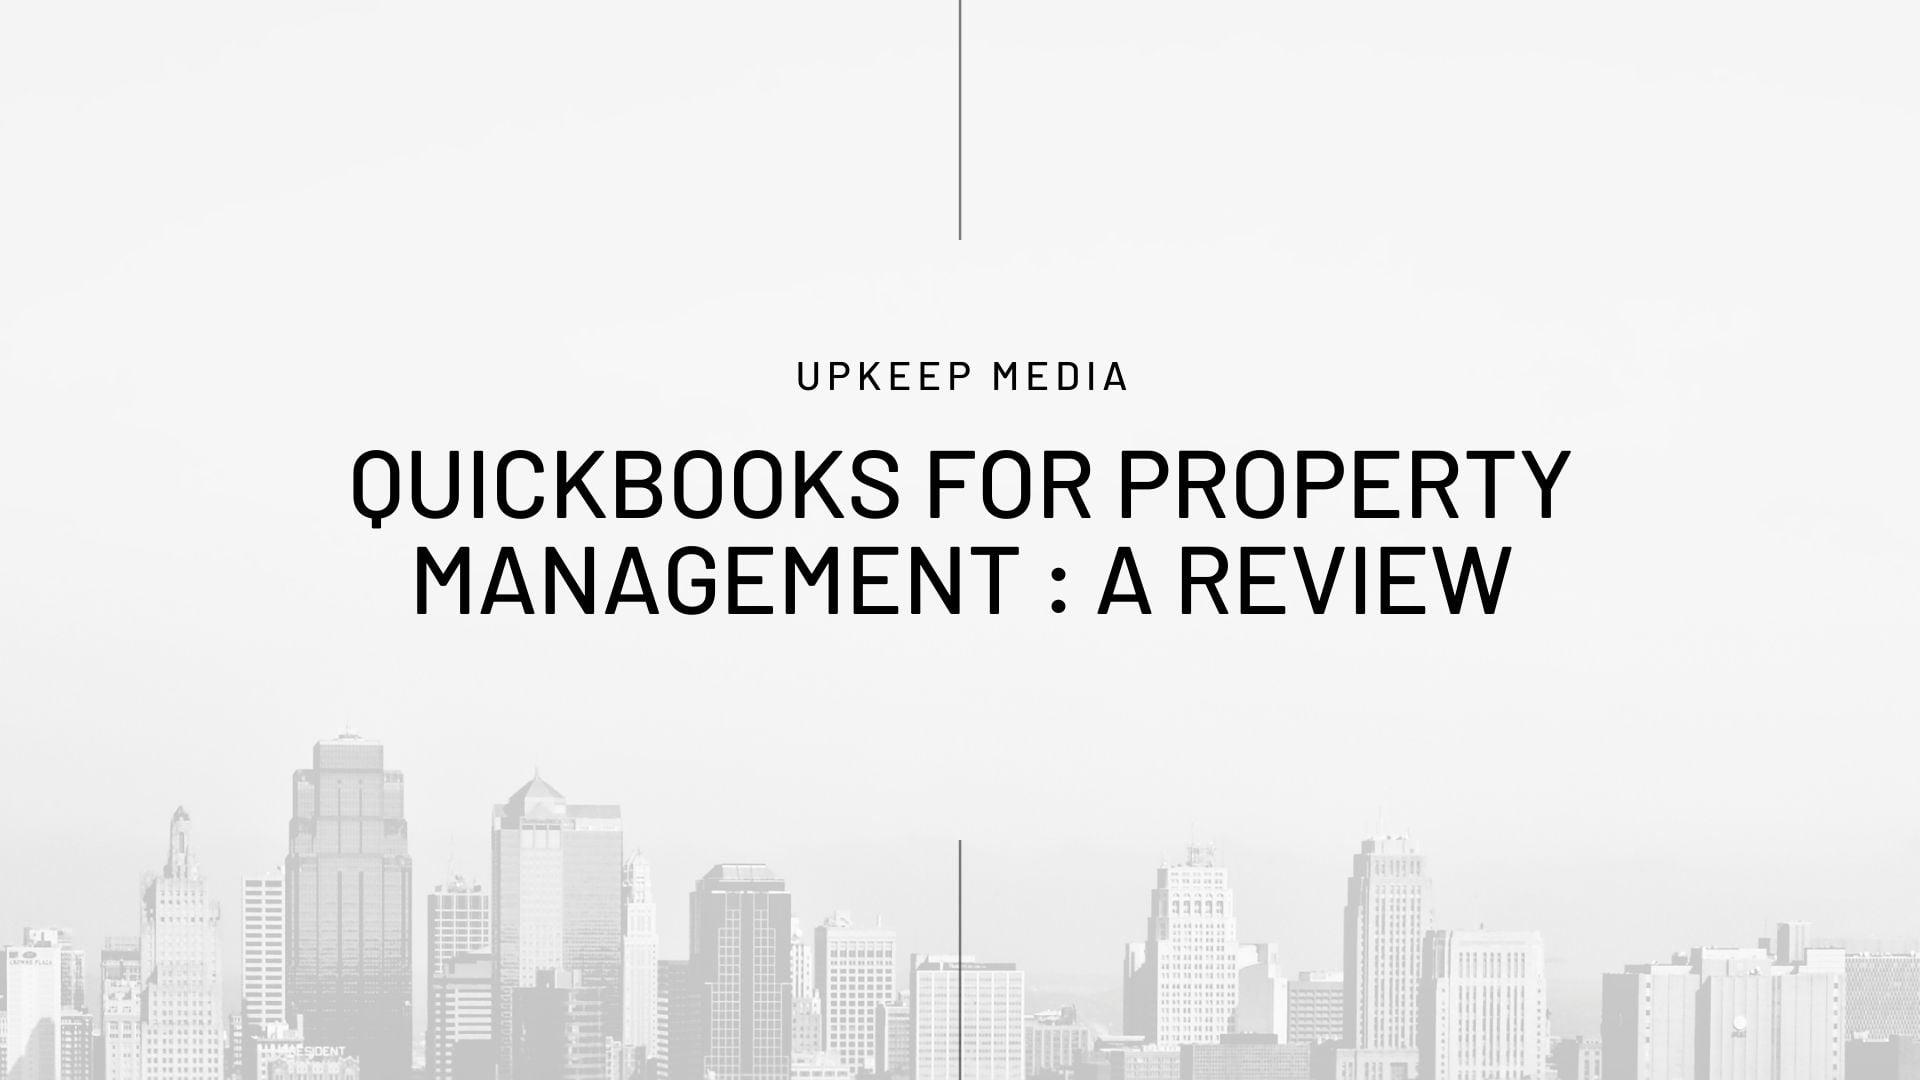 quickbooks property management